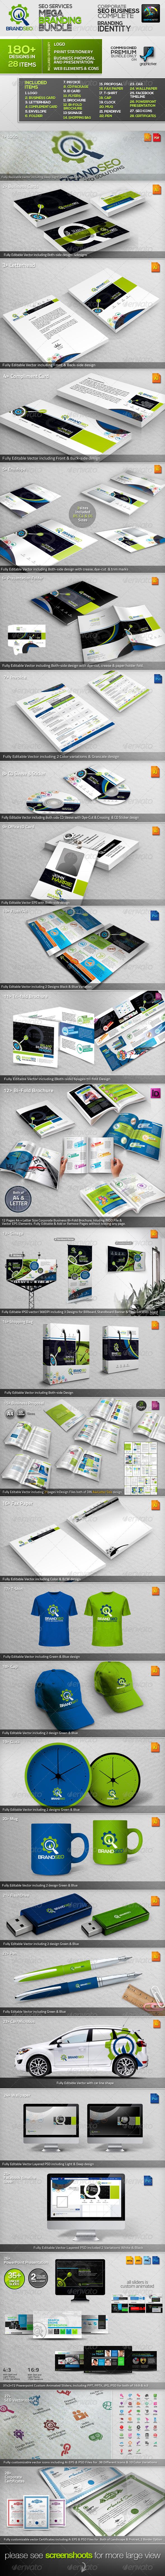 GraphicRiver BrandSEO SEO Business ID Mega Branding Bundle 4425195